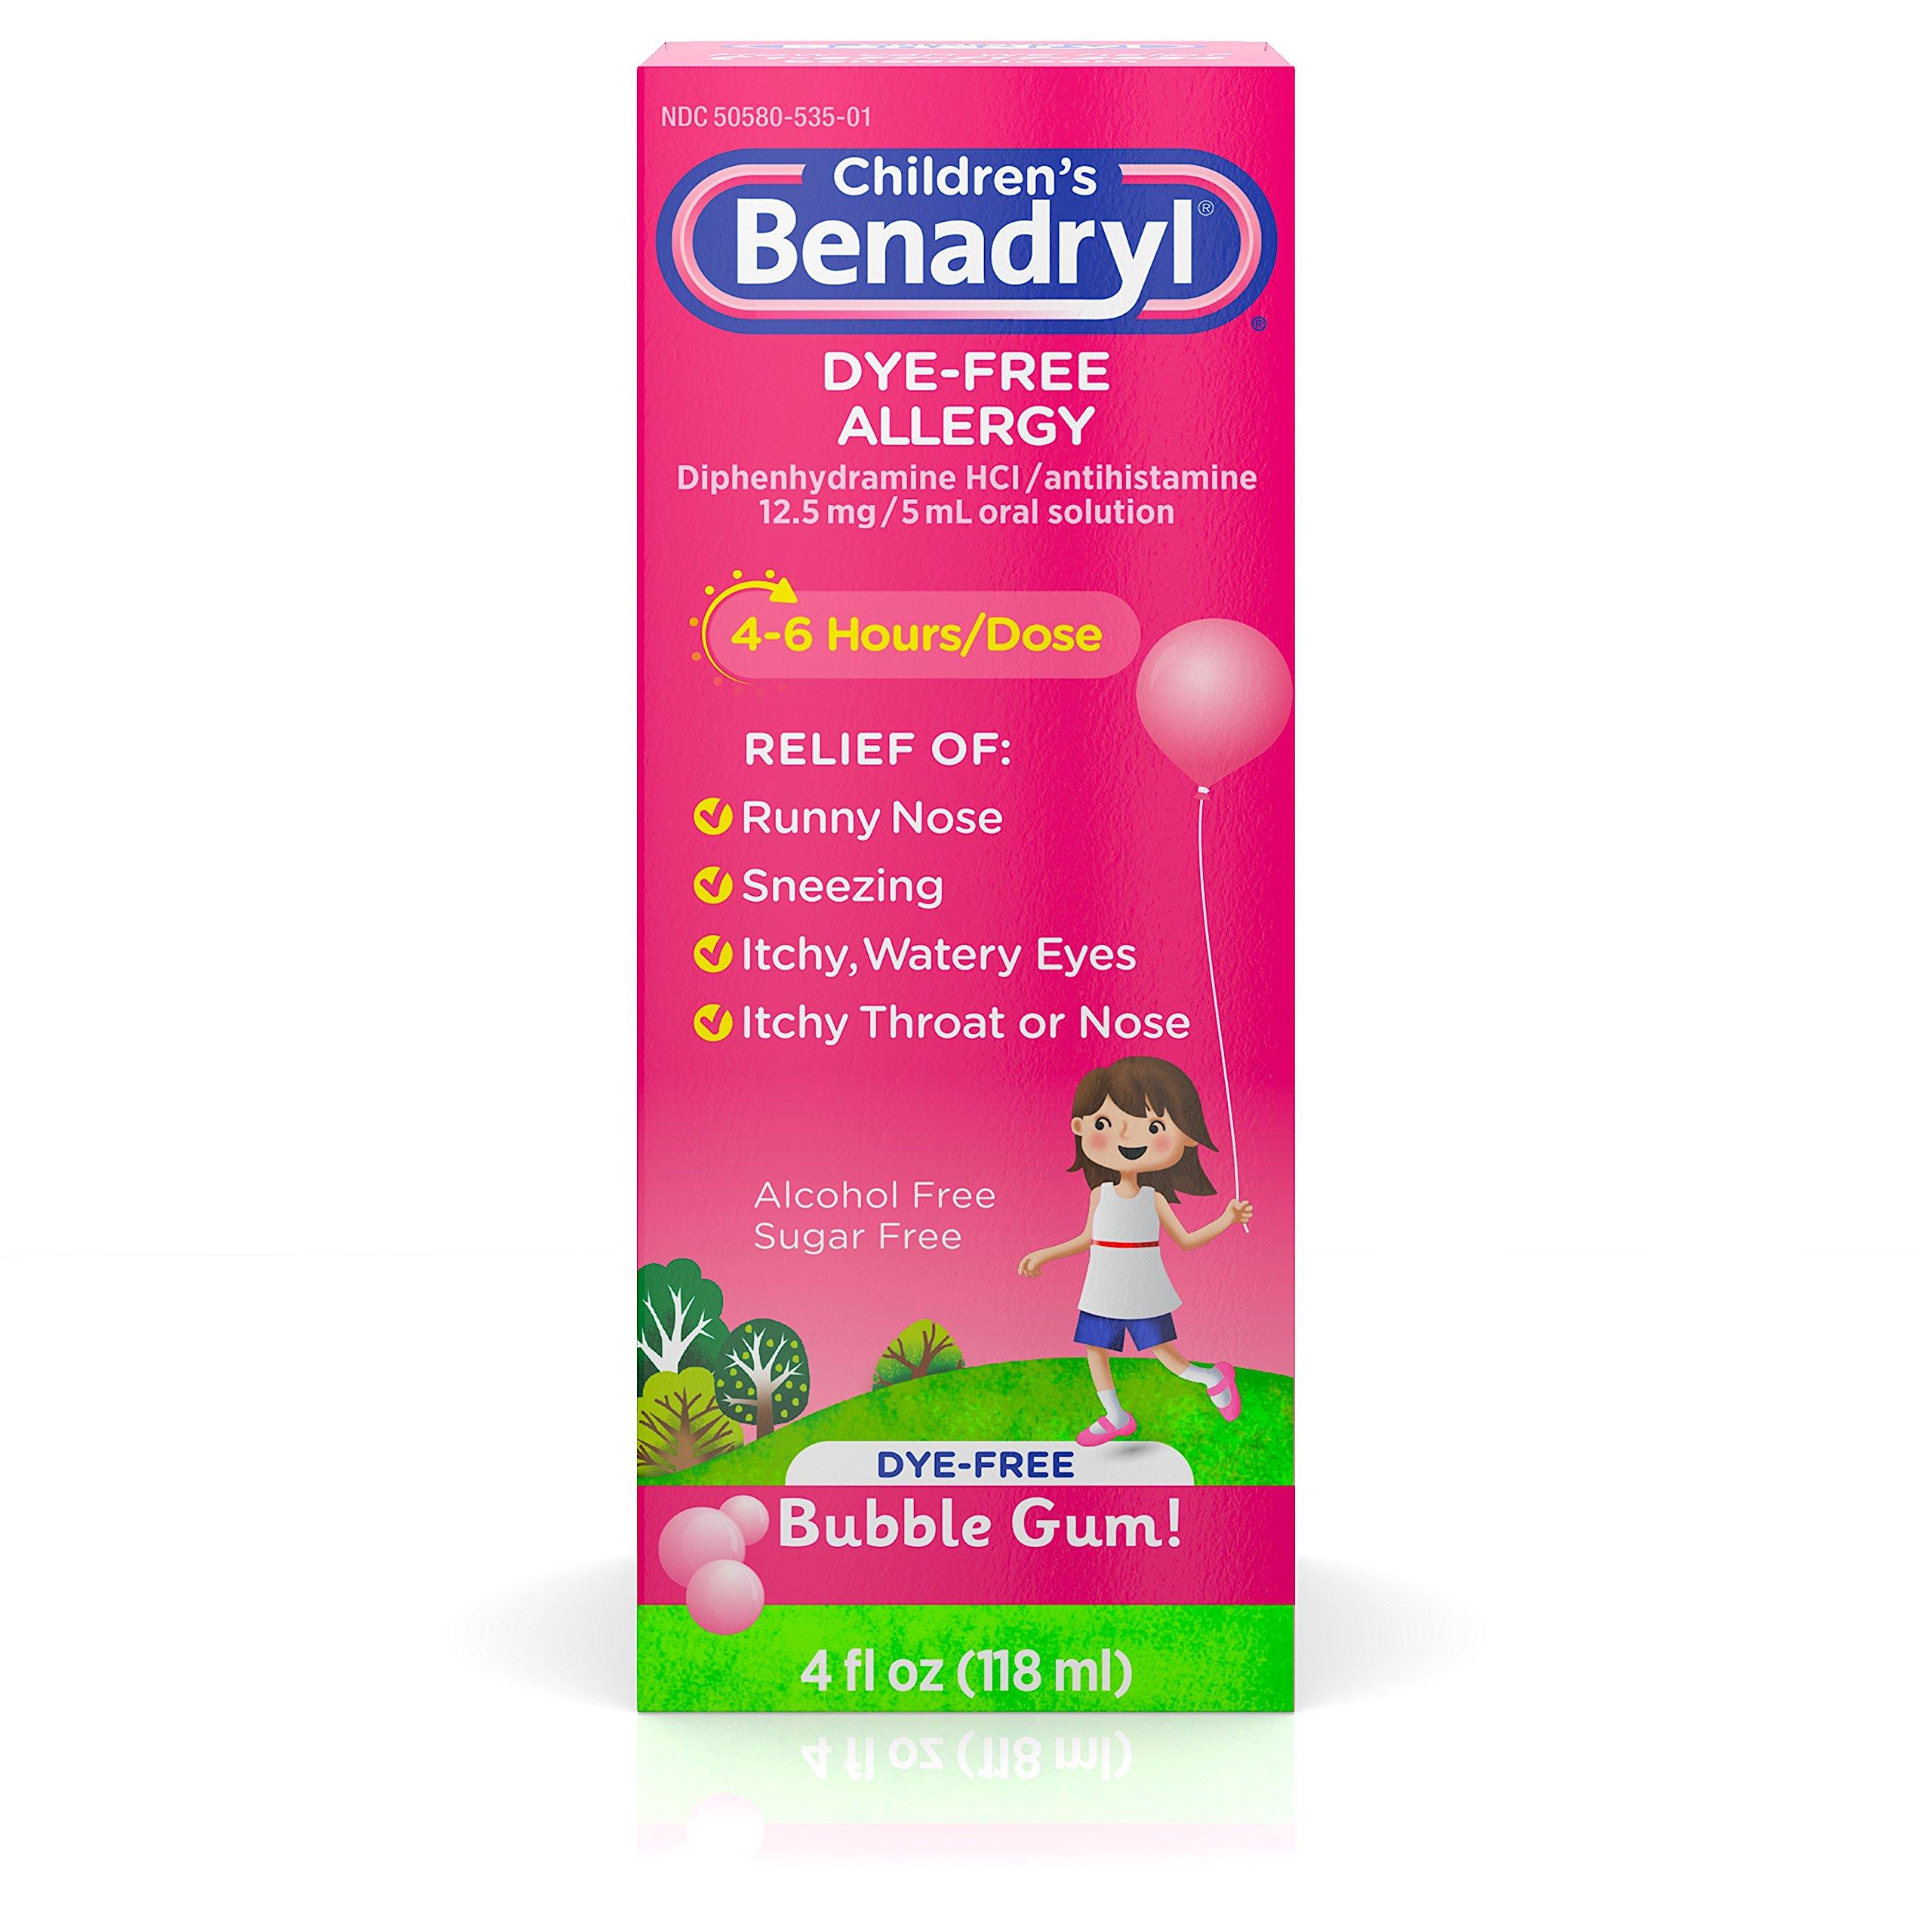 Children's Benadryl Dye-Free Allergy Liquid with Diphenhydramine HCl, Bubble Gum Flavor, 4 fl. oz